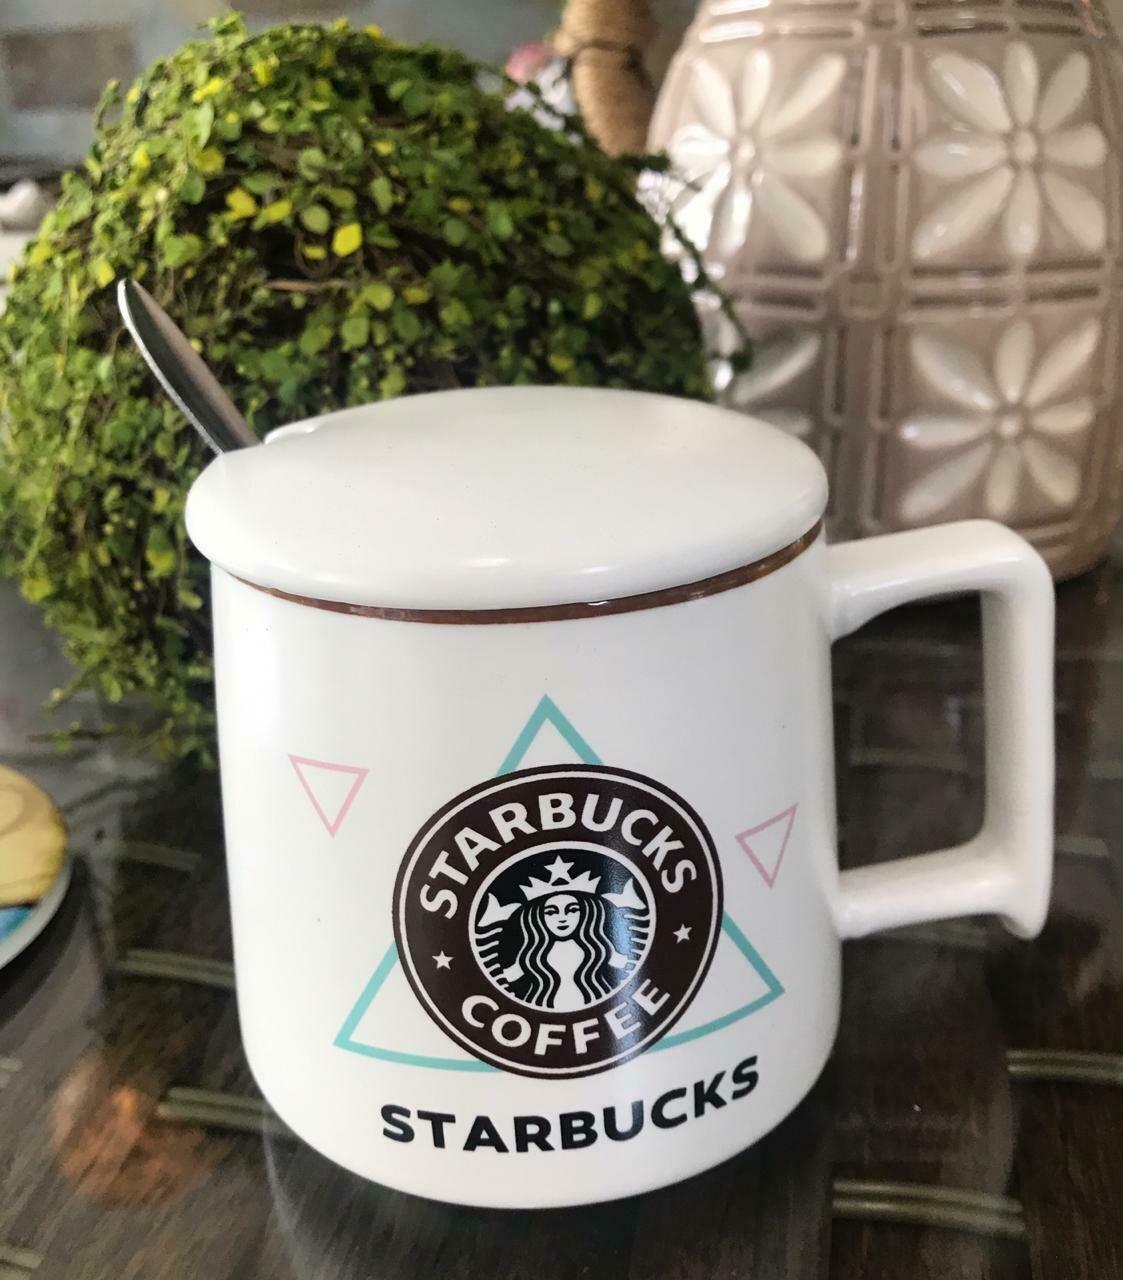 Jarro Starbucks 3 - VersionPastel  - Tapa Cerámica